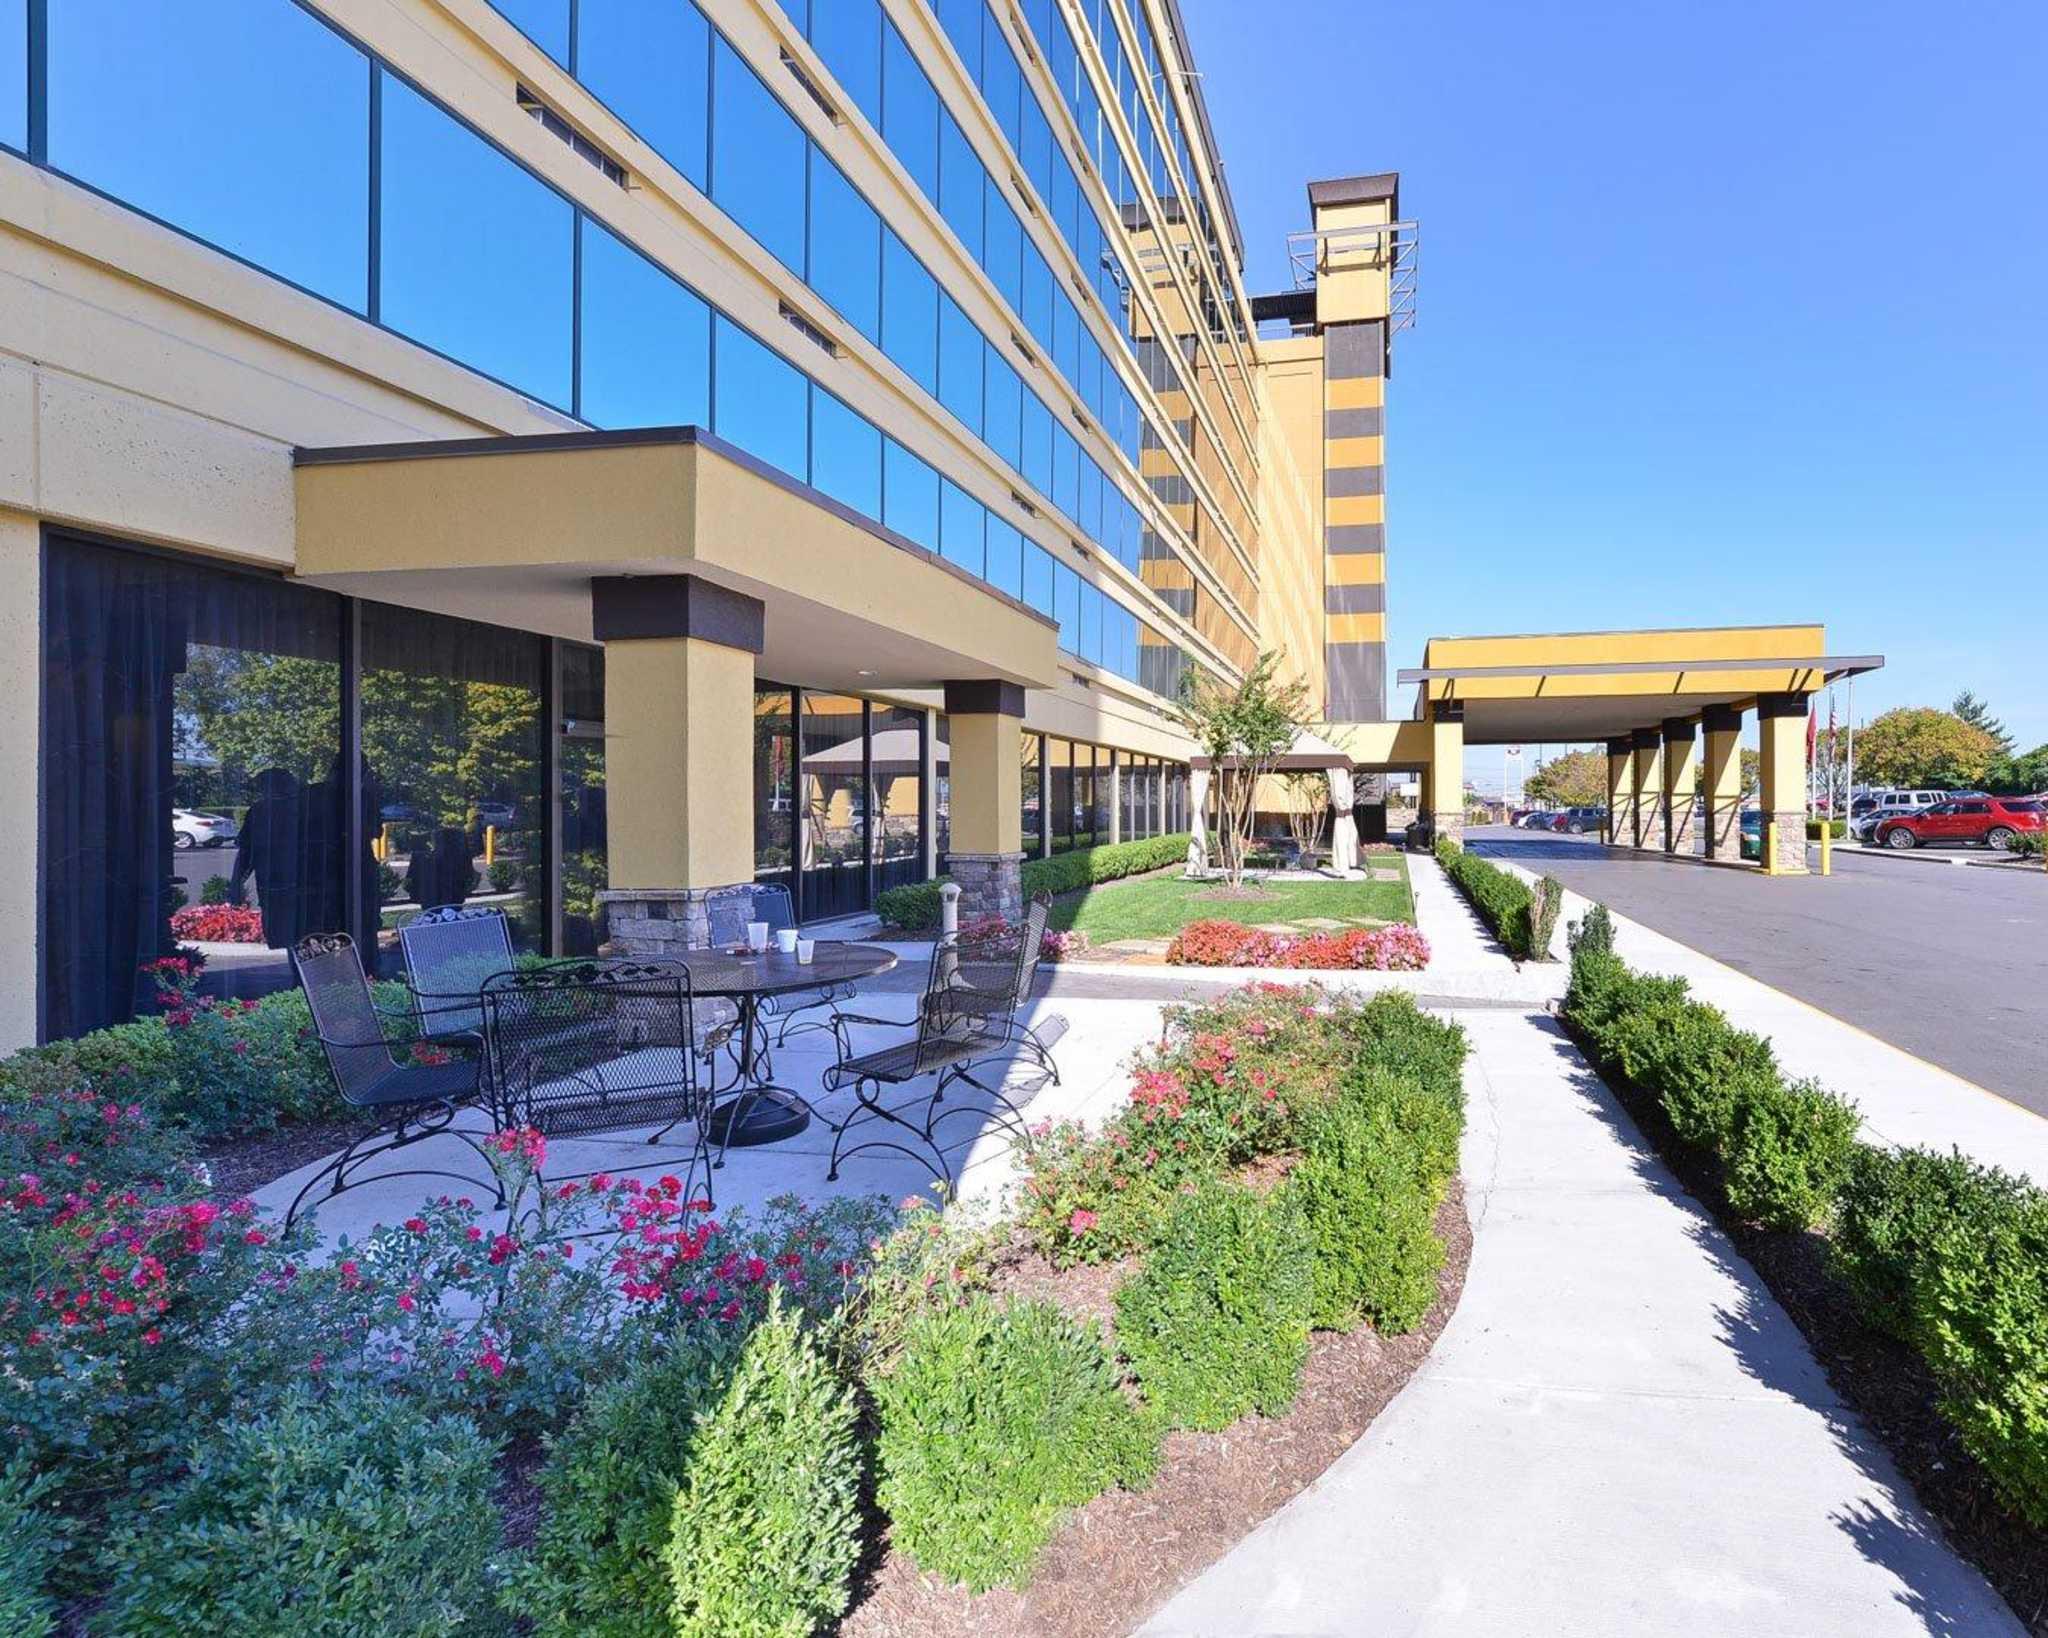 Clarion Hotel Nashville Downtown - Stadium in Nashville, TN - (623) 209-7...